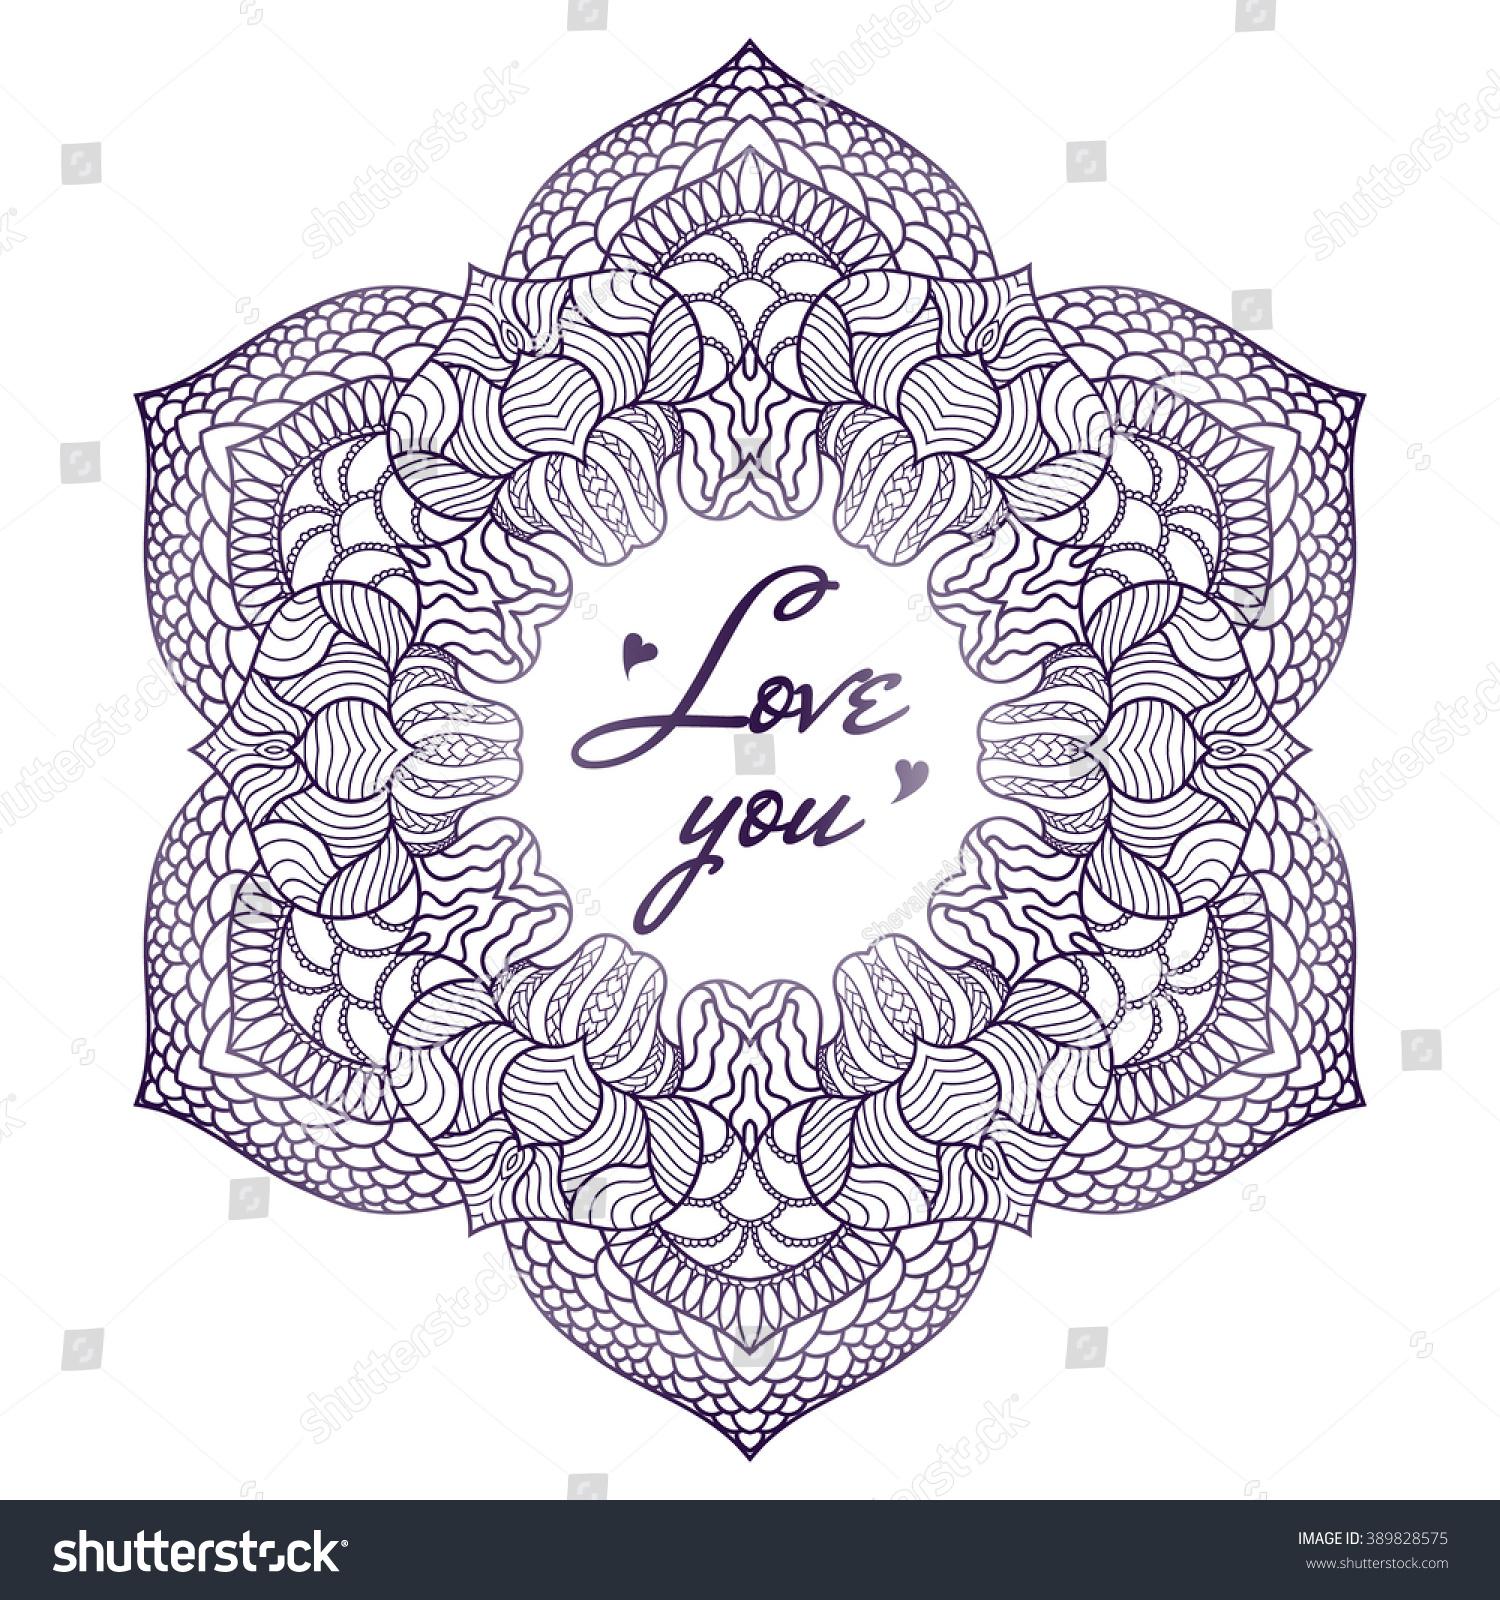 Download Vector Mandala Love You Inscription Hand Stock Vector 389828575 - Shutterstock